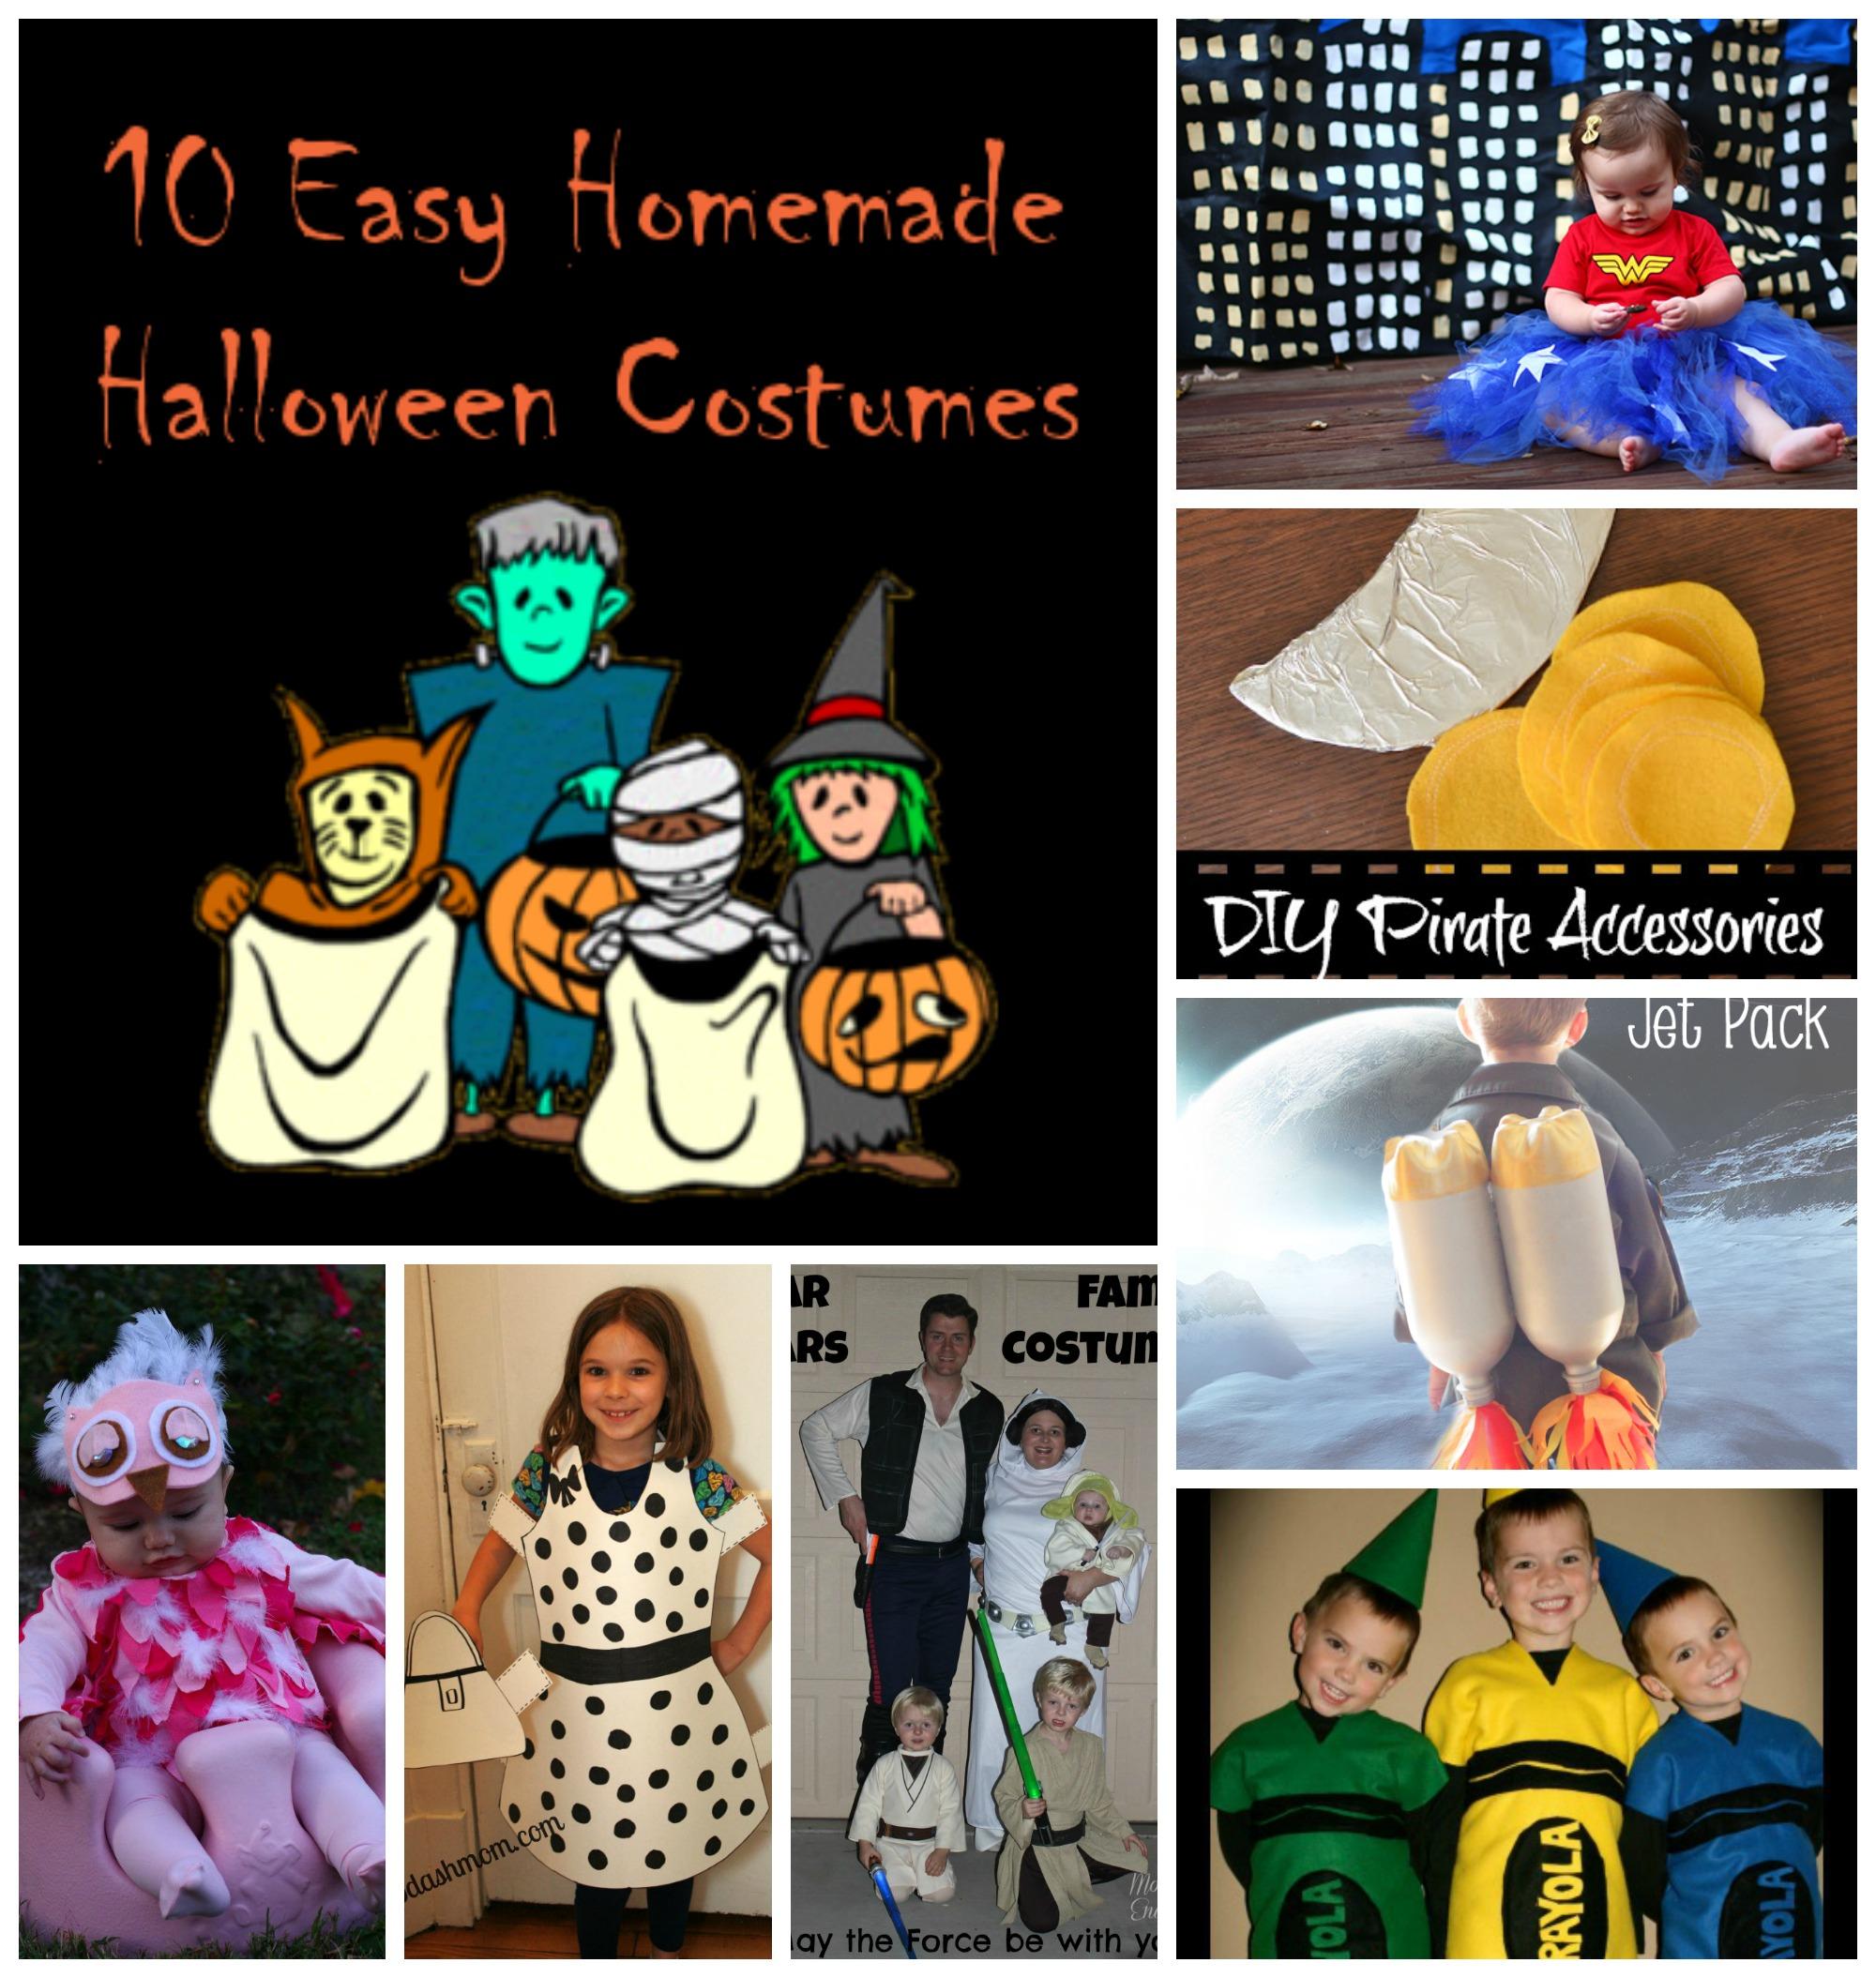 10 Easy Handmade Halloween Costumes